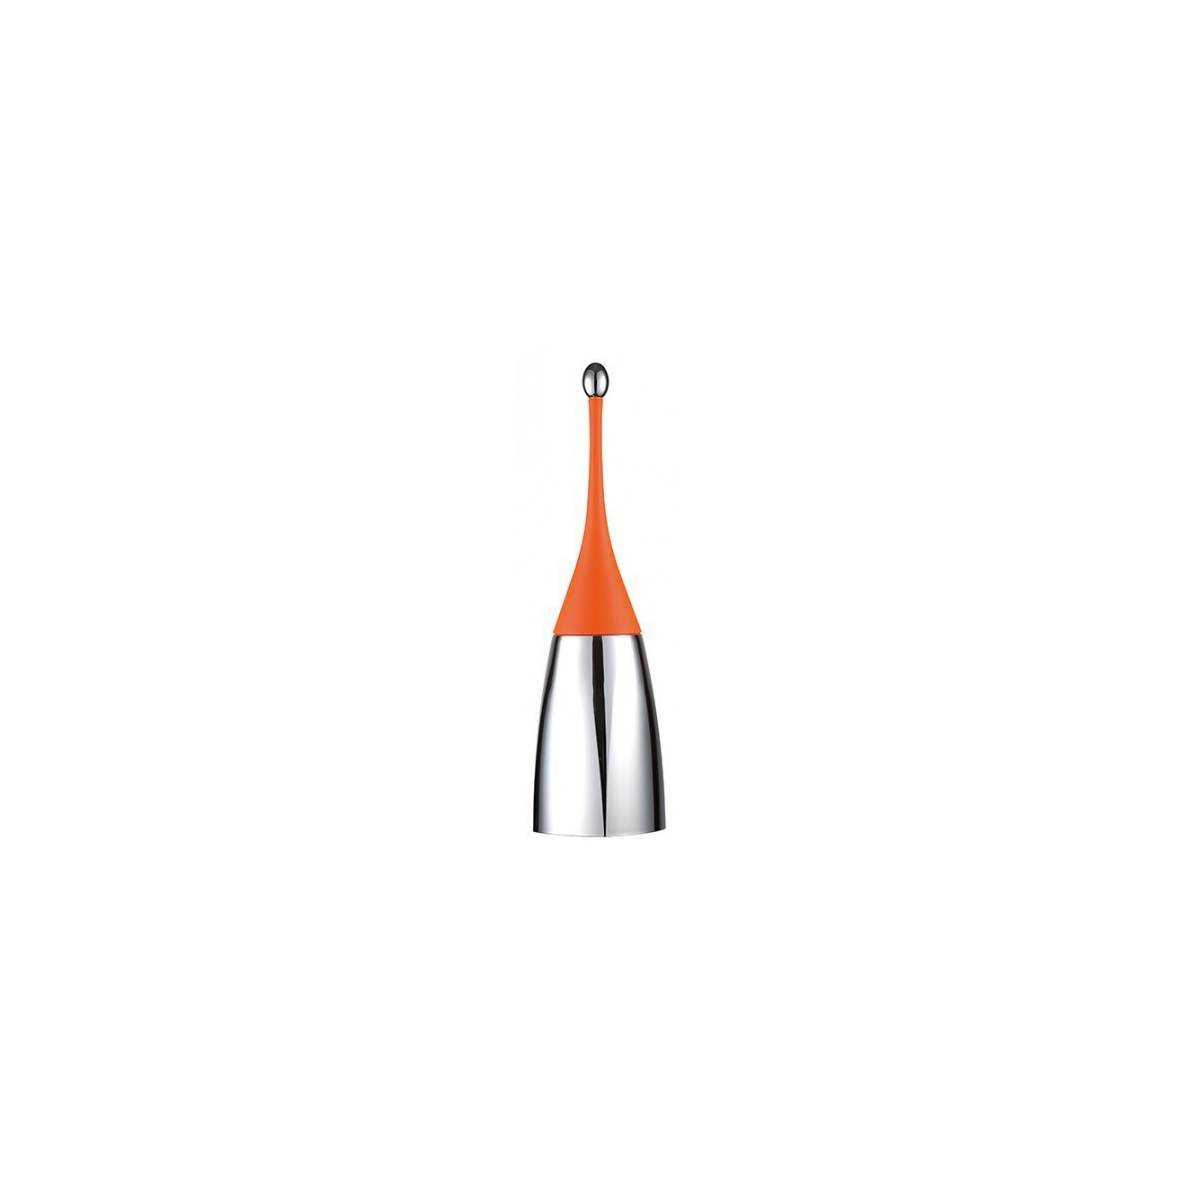 Щетка для унитаза напольная COLORED (654AR) 654AR Mar Plast